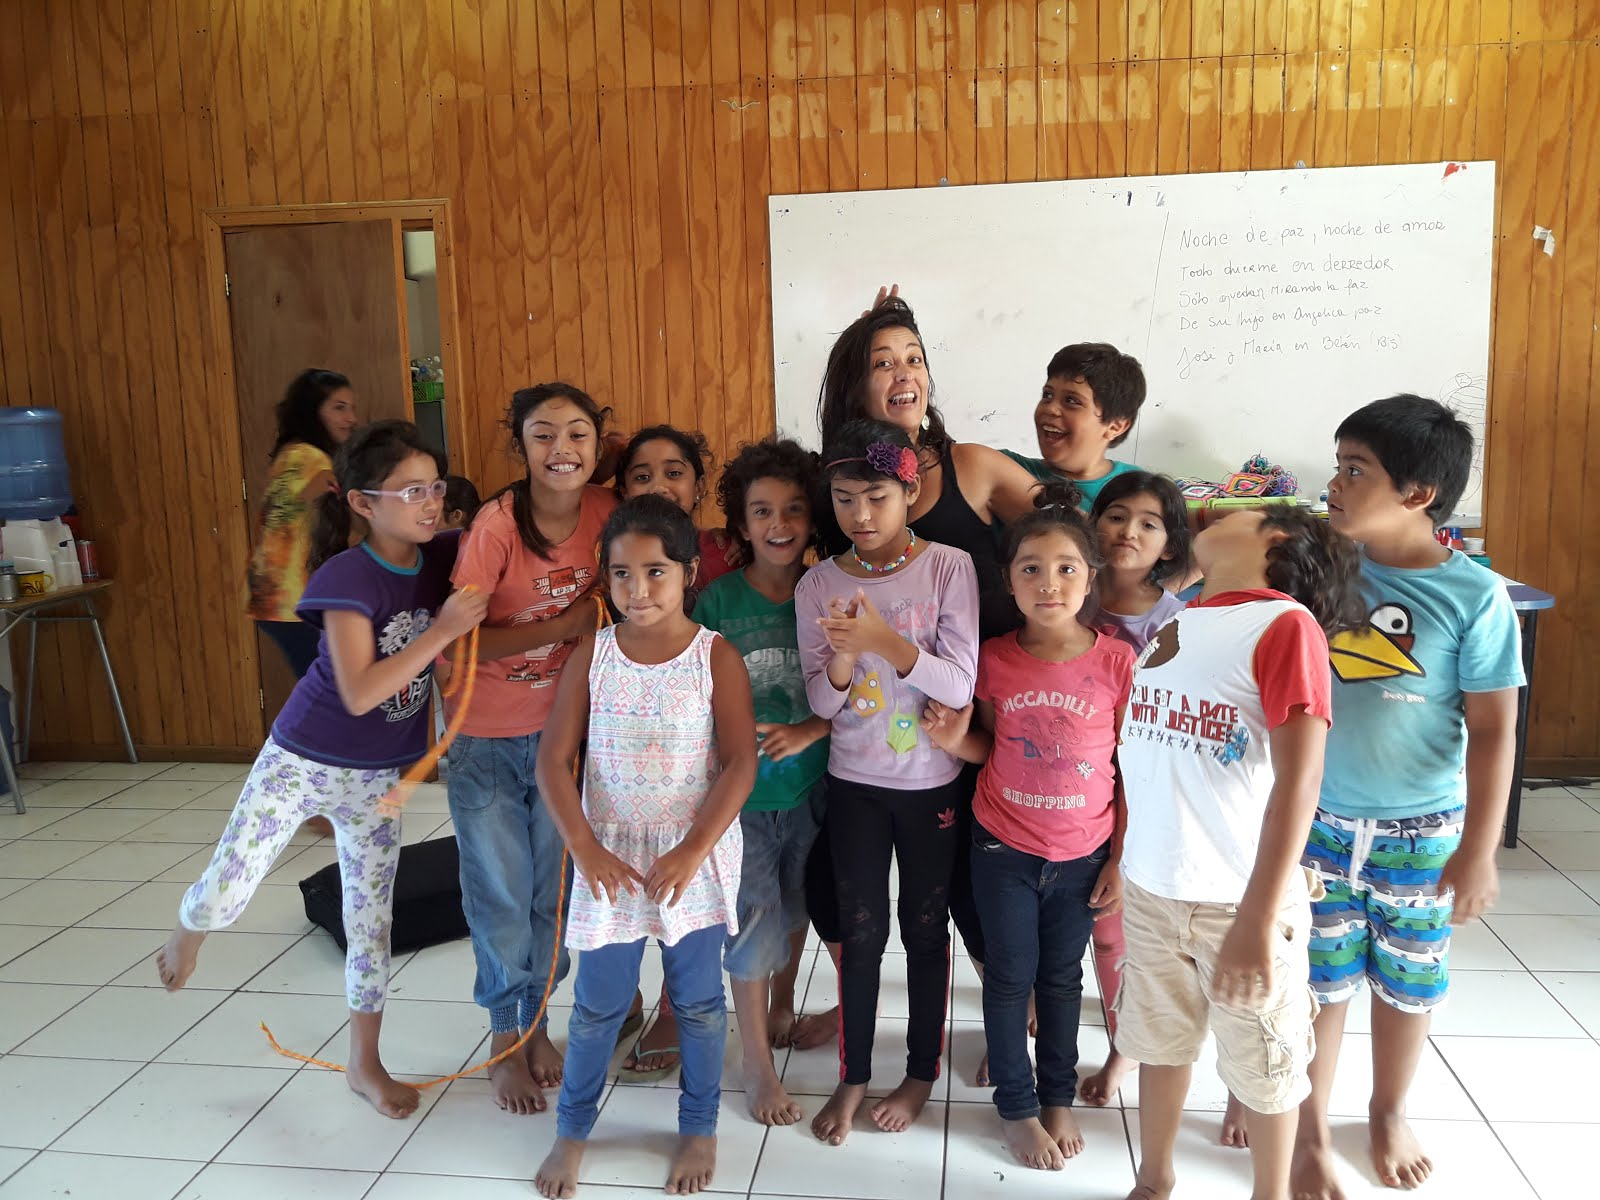 Taller de Teatro para niños. Rapa Nui, 2017